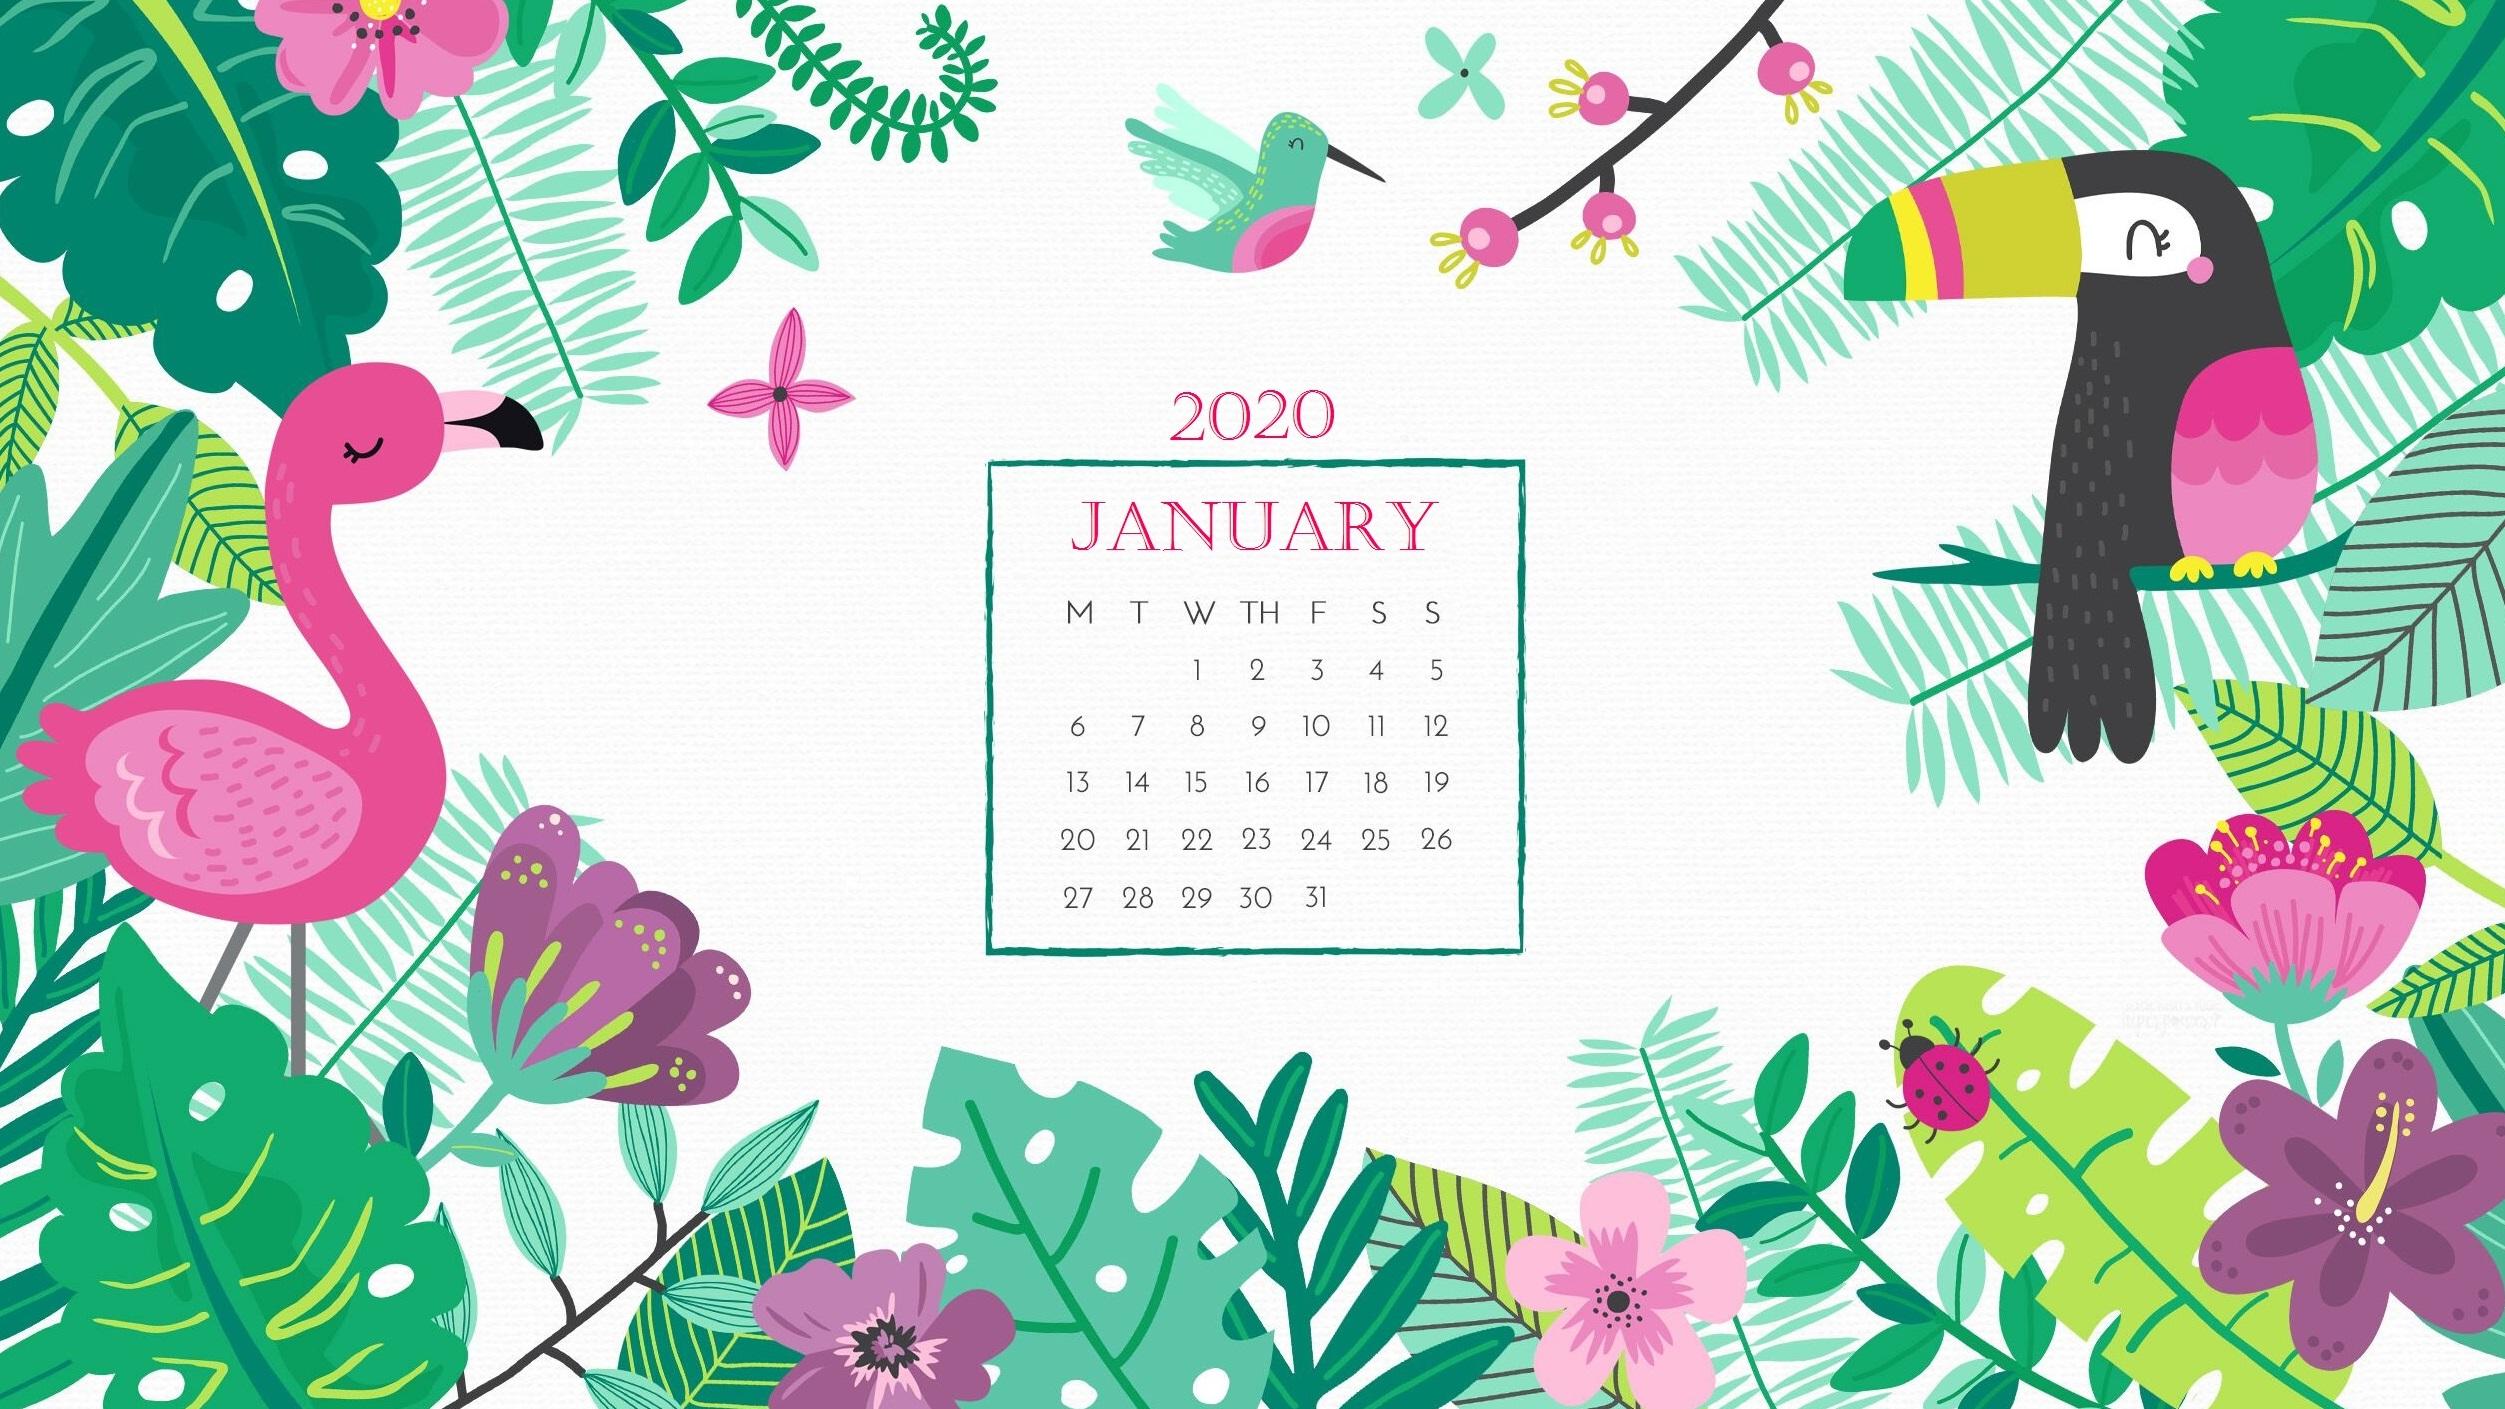 Desktop Calendar Wallpaper January 2020